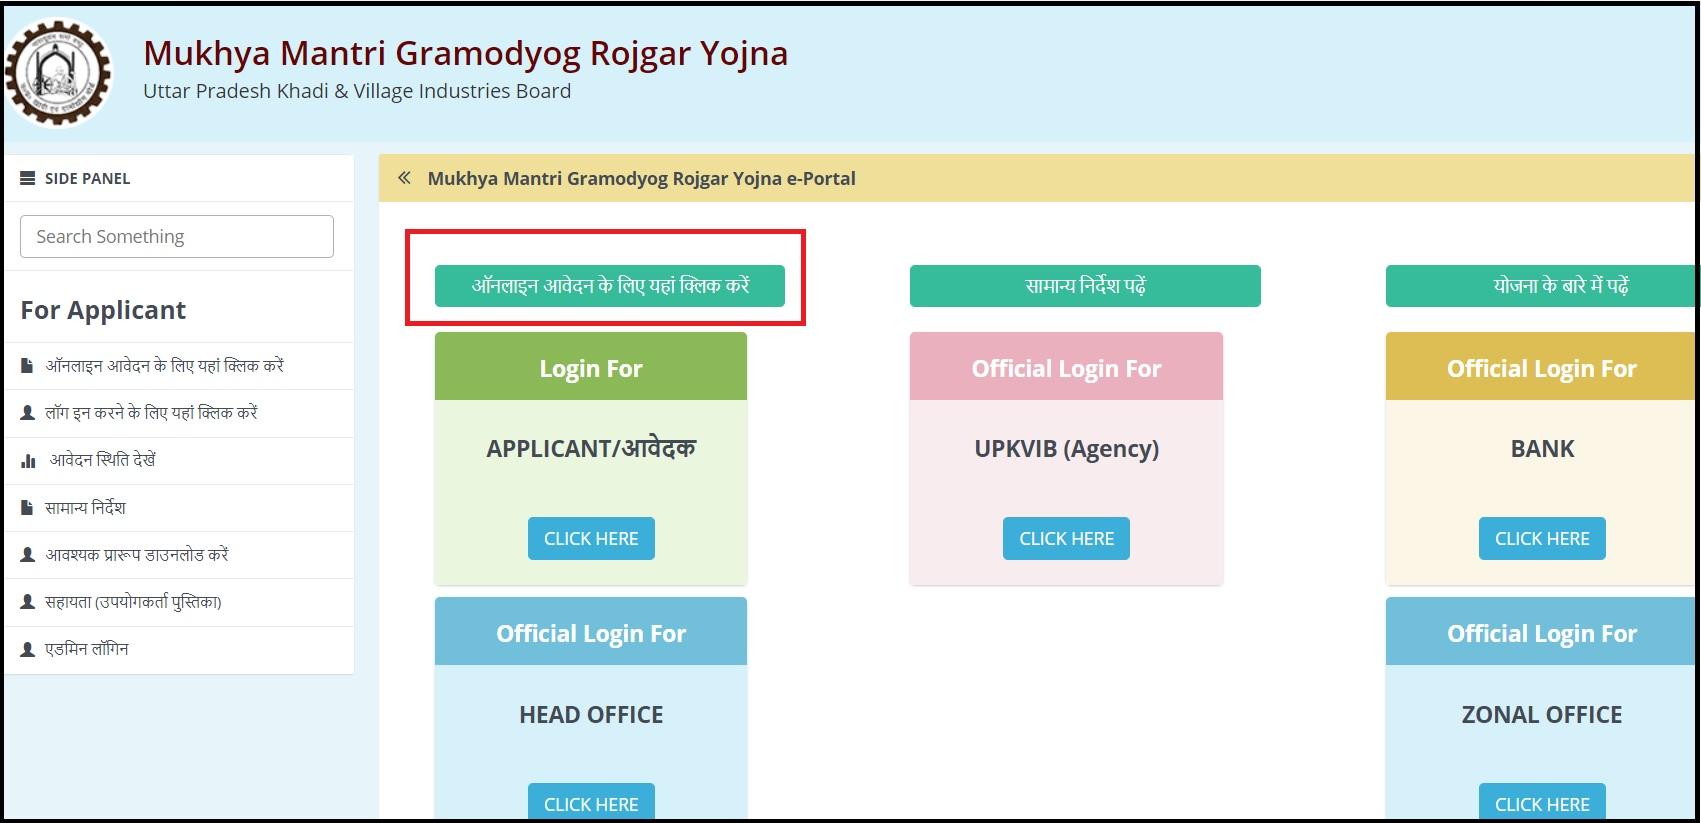 Mukhyamantri Gramodhyog Rojgaar Yojana online registration